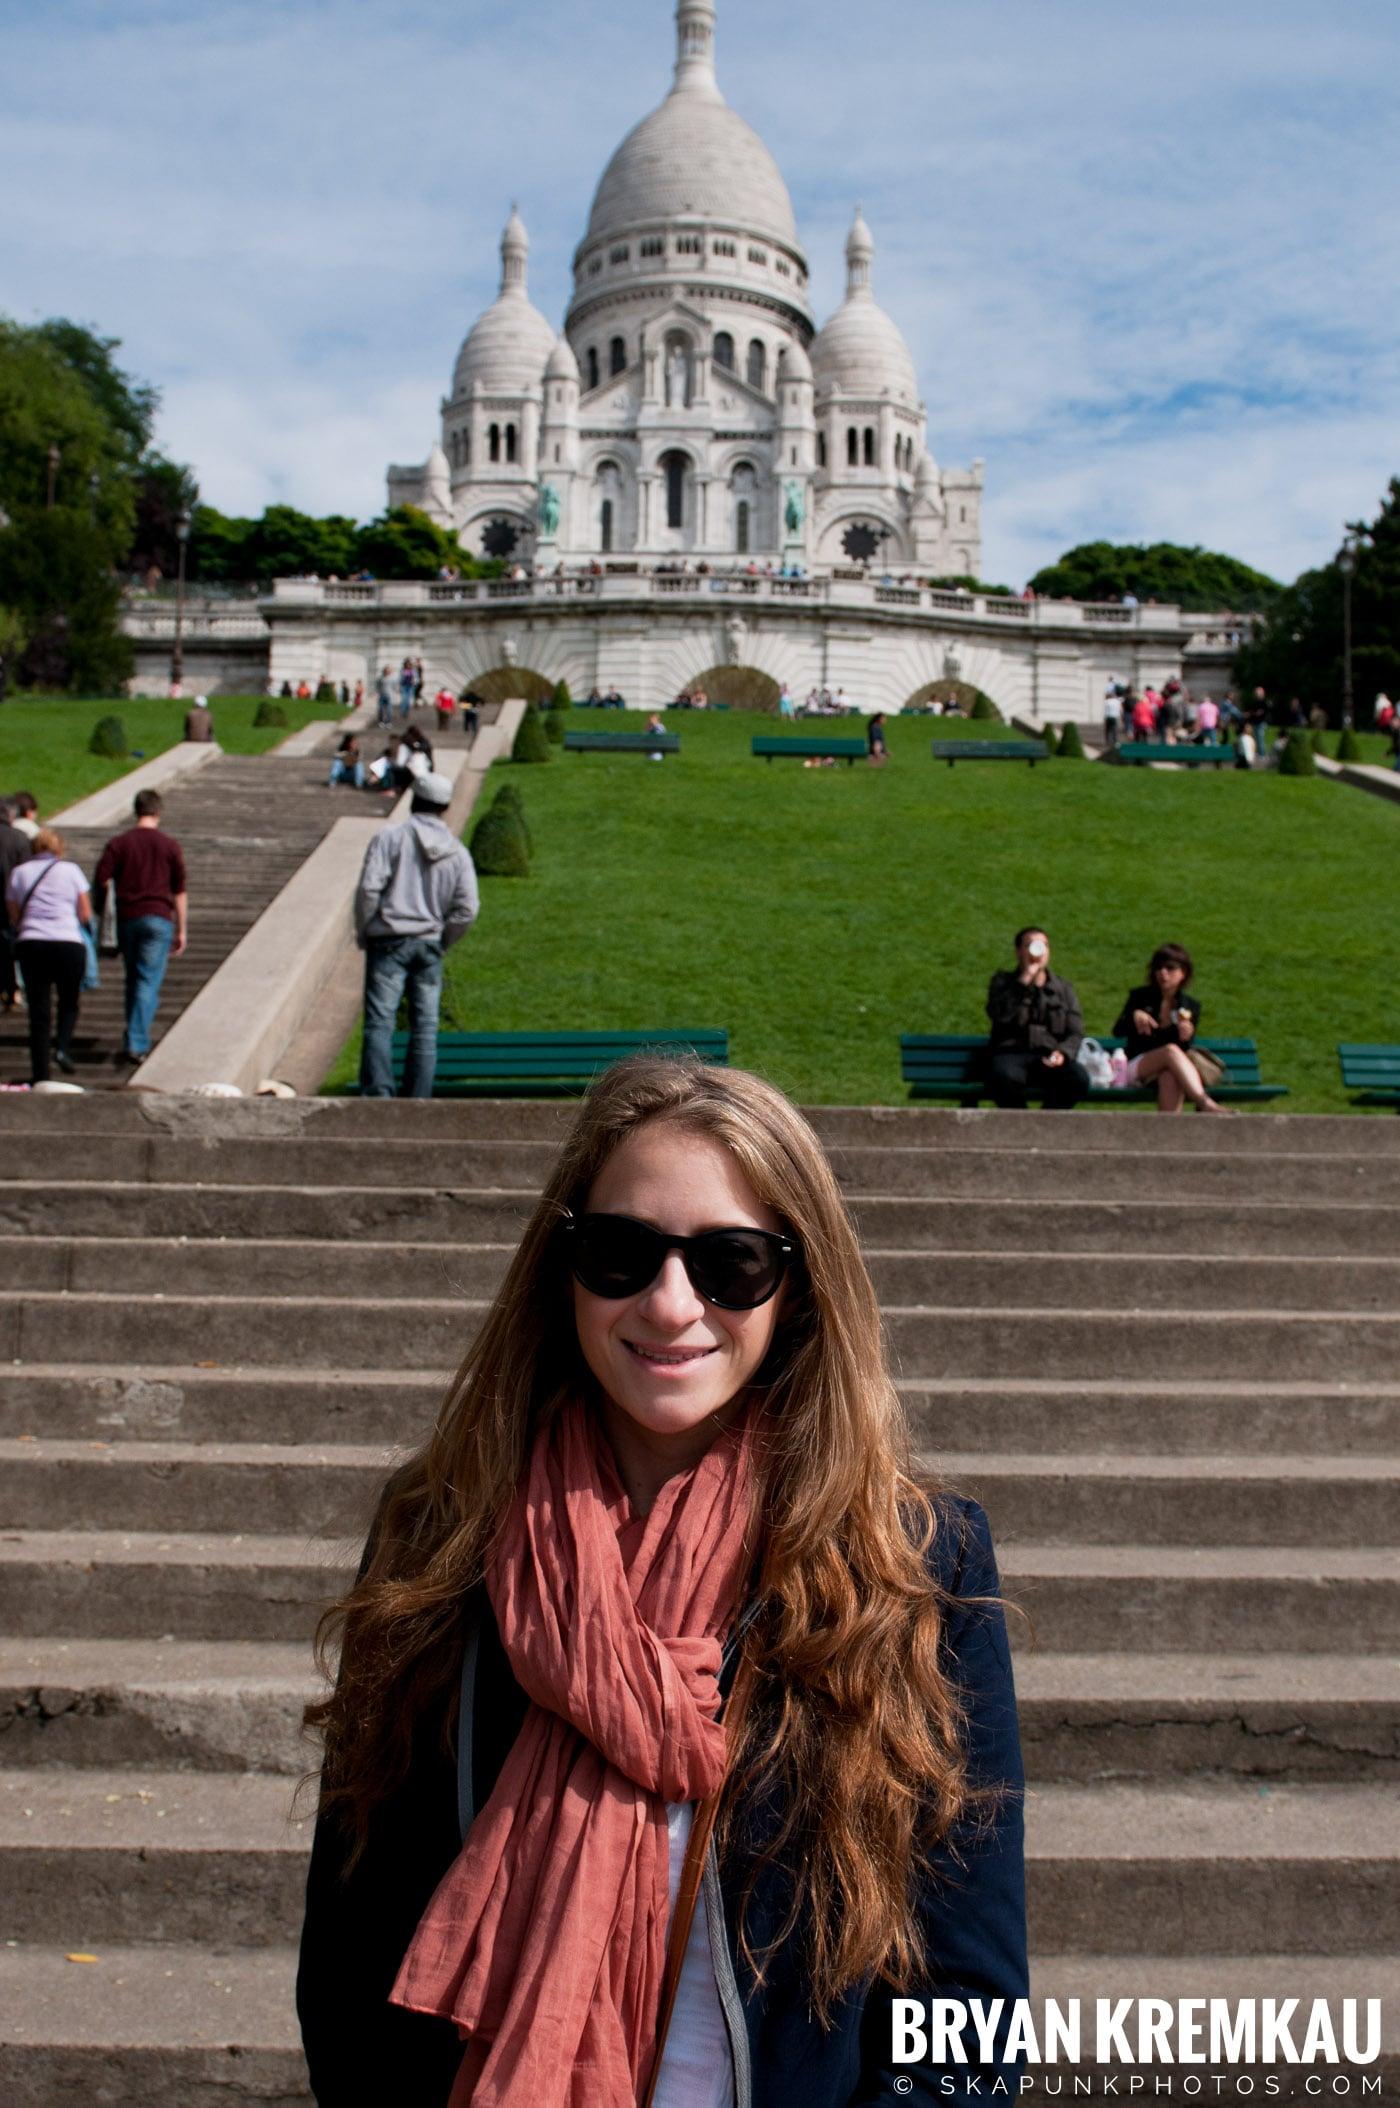 Paris, France Honeymoon - Day 6 - 7.23.11 (45)